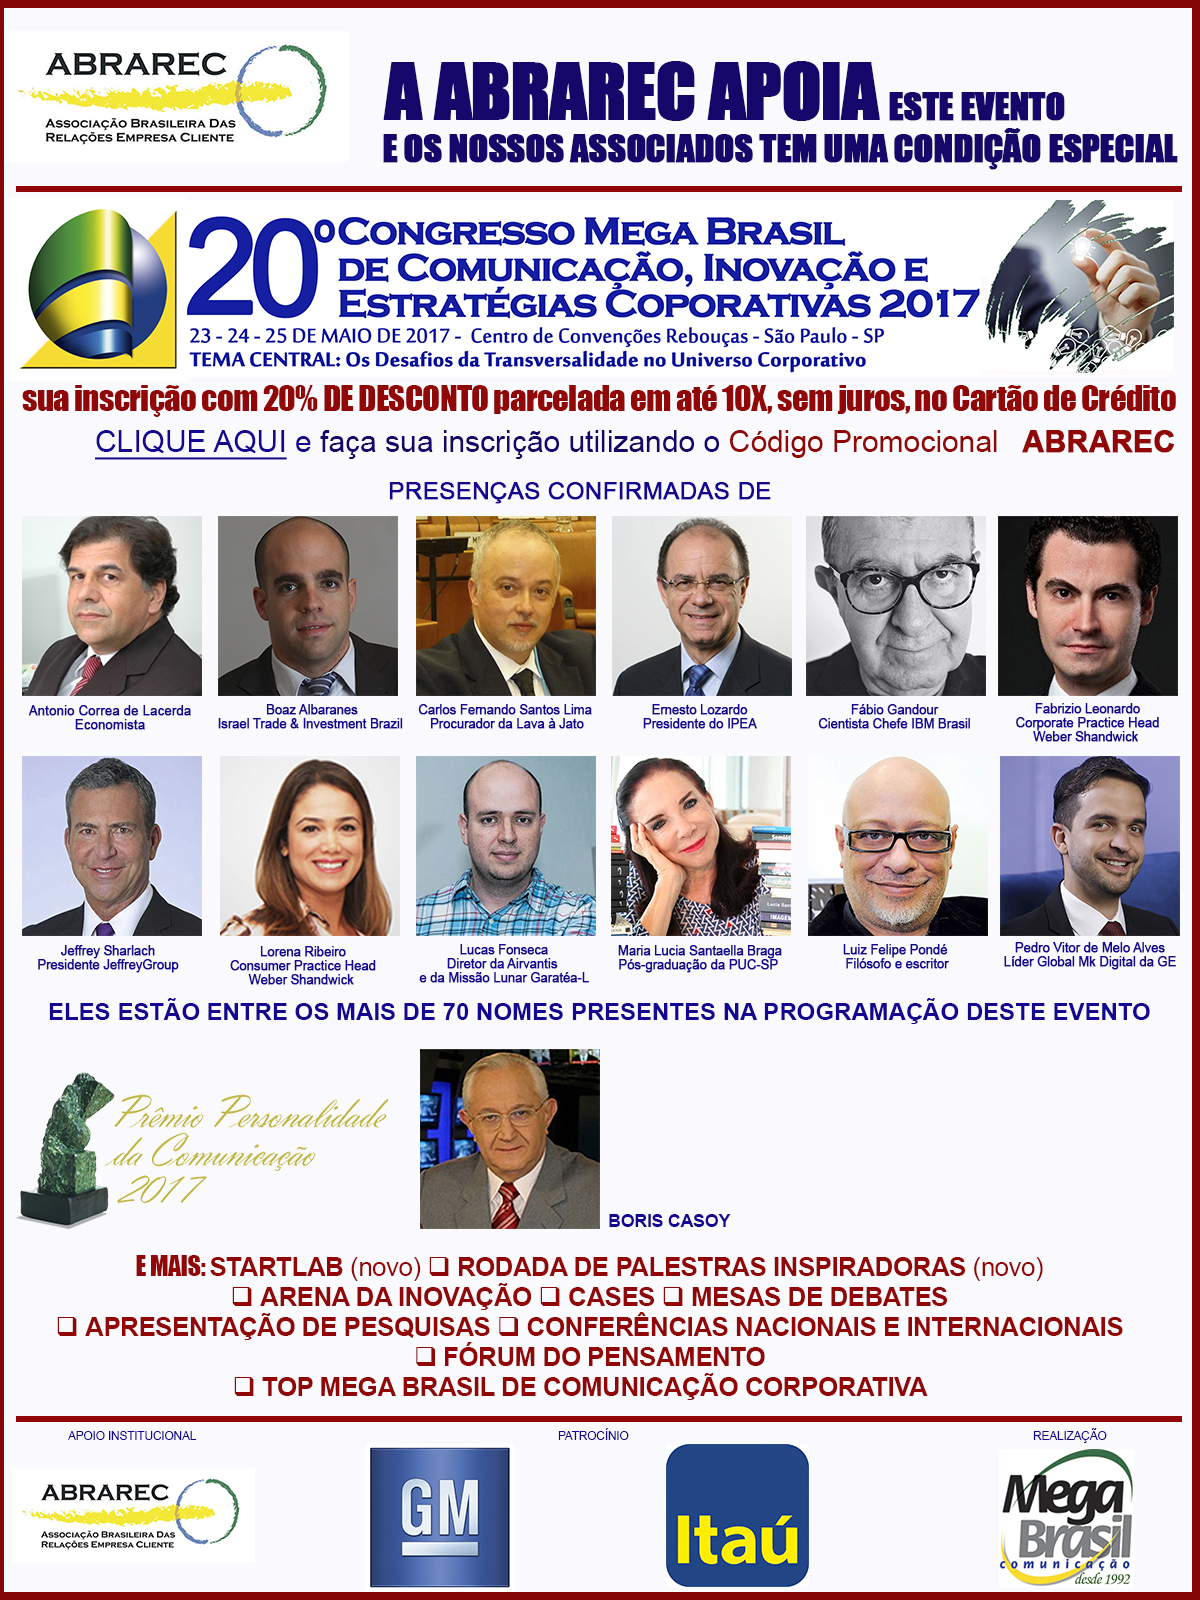 ABRAREC no Congresso Mega Brasil 2017